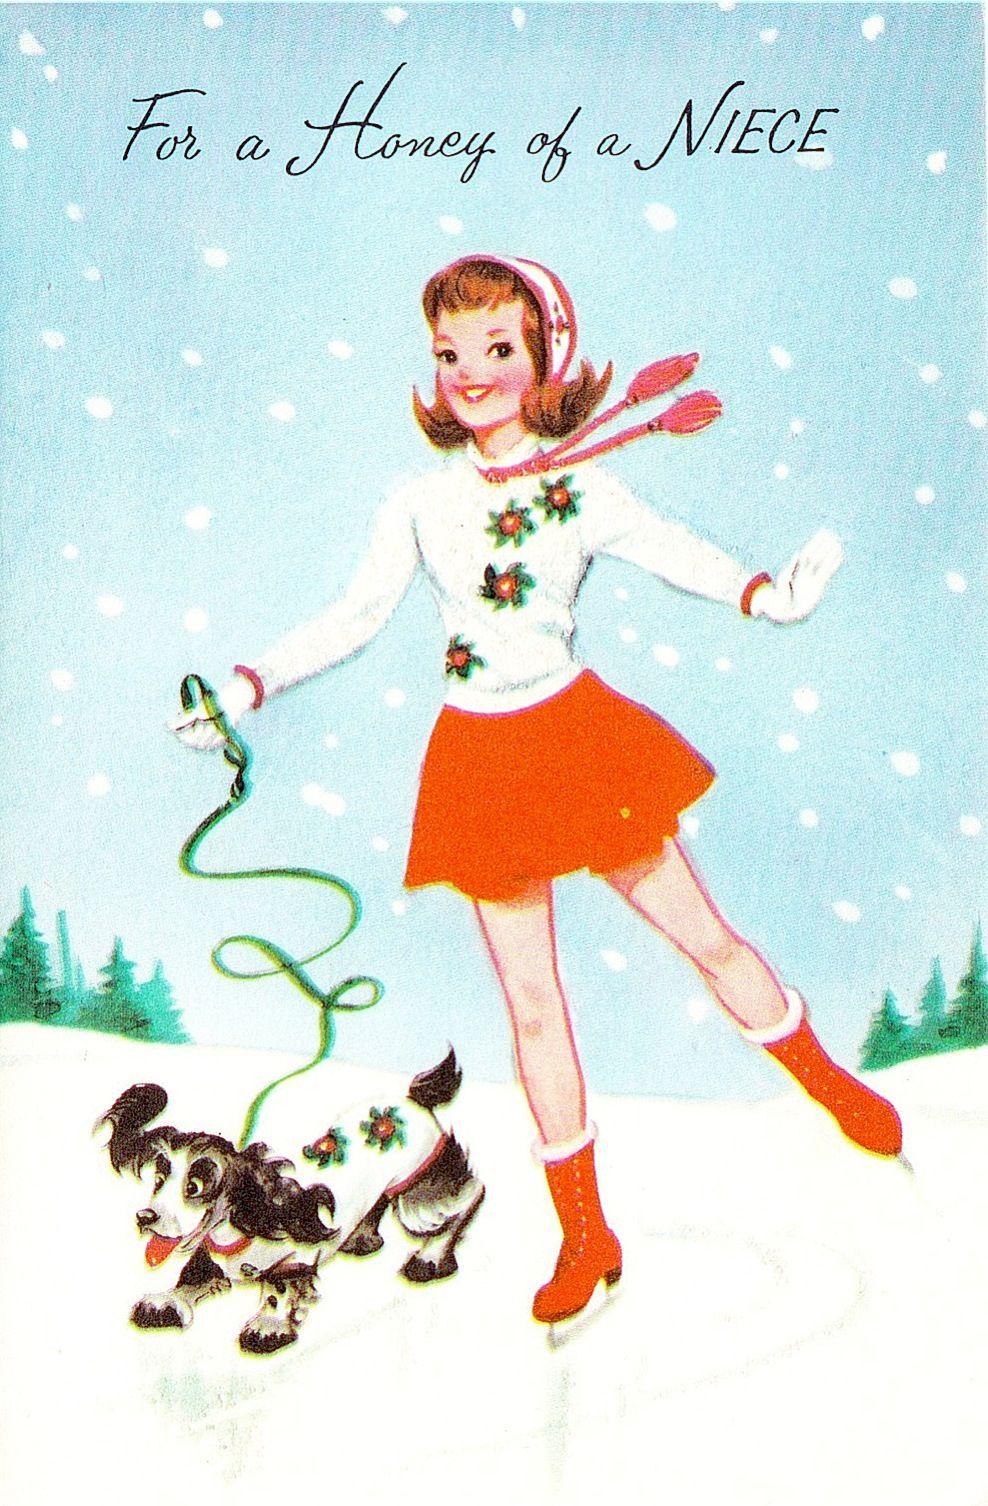 Vintage Glitter Sweater Ice Skater Girl w/ Dog Norcross Christmas Greeting Card